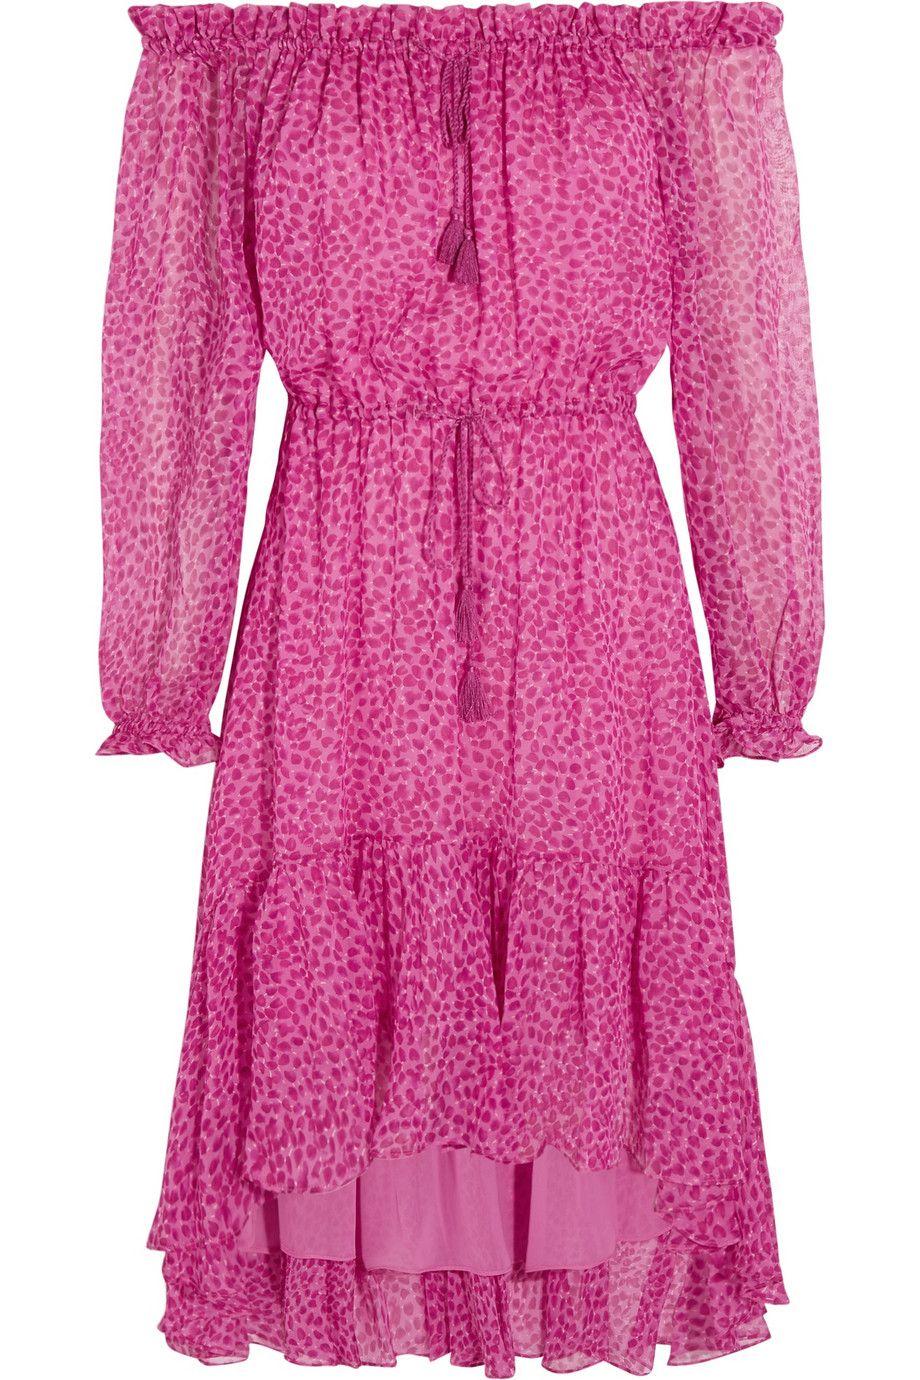 "Diane von Furstenberg Camila Printed Silk-Chiffon Dress, $470; &lt;a href=""http://www.net-a-porter.com/product/573149/Diane_von_Furstenberg/camila-printed-silk-chiffon-dress""&gt;net-a-porter.com&lt;/a&gt;   <!--EndFragment-->"